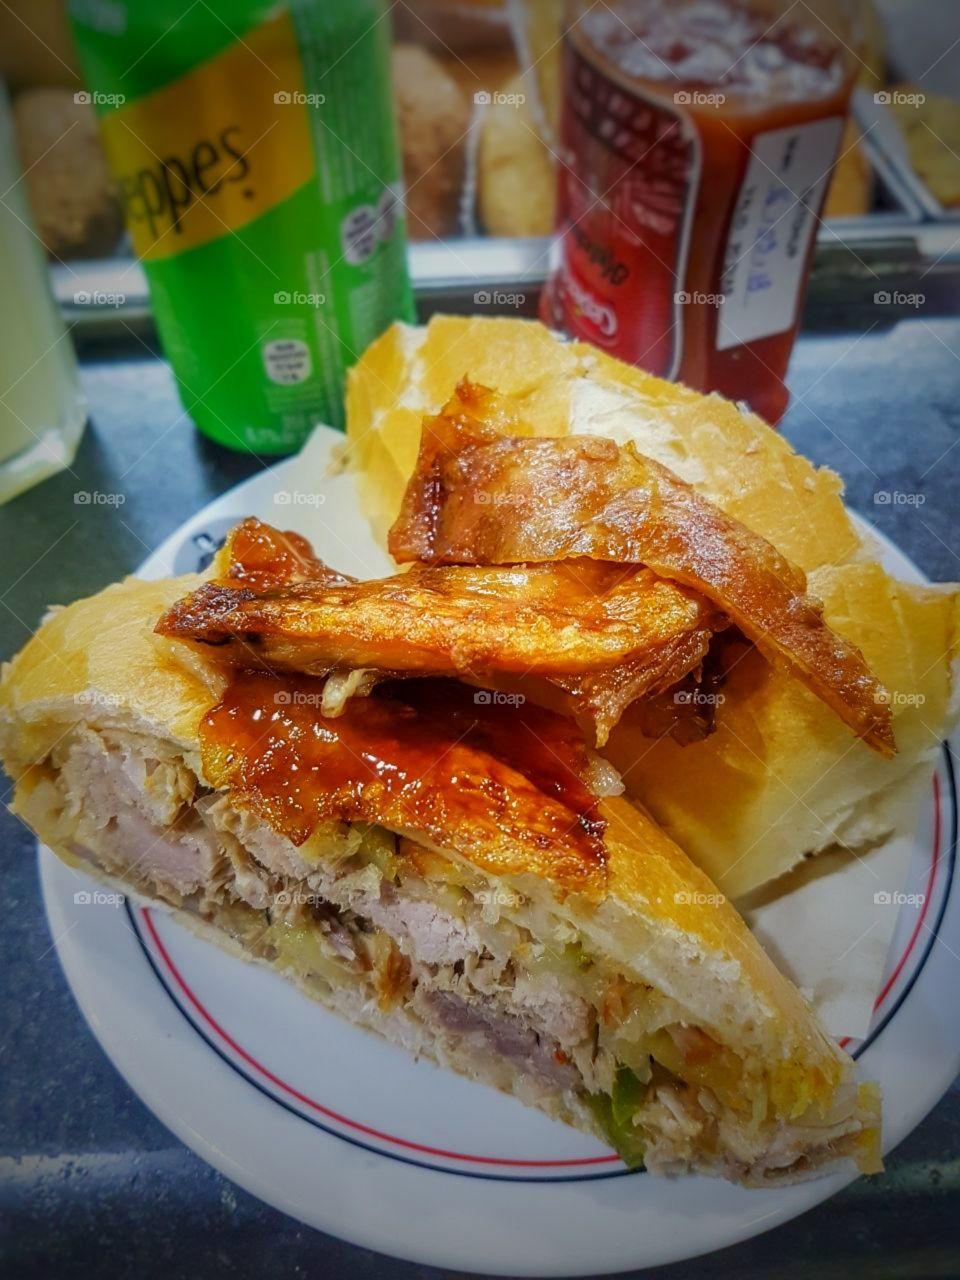 Food sandwich world cup